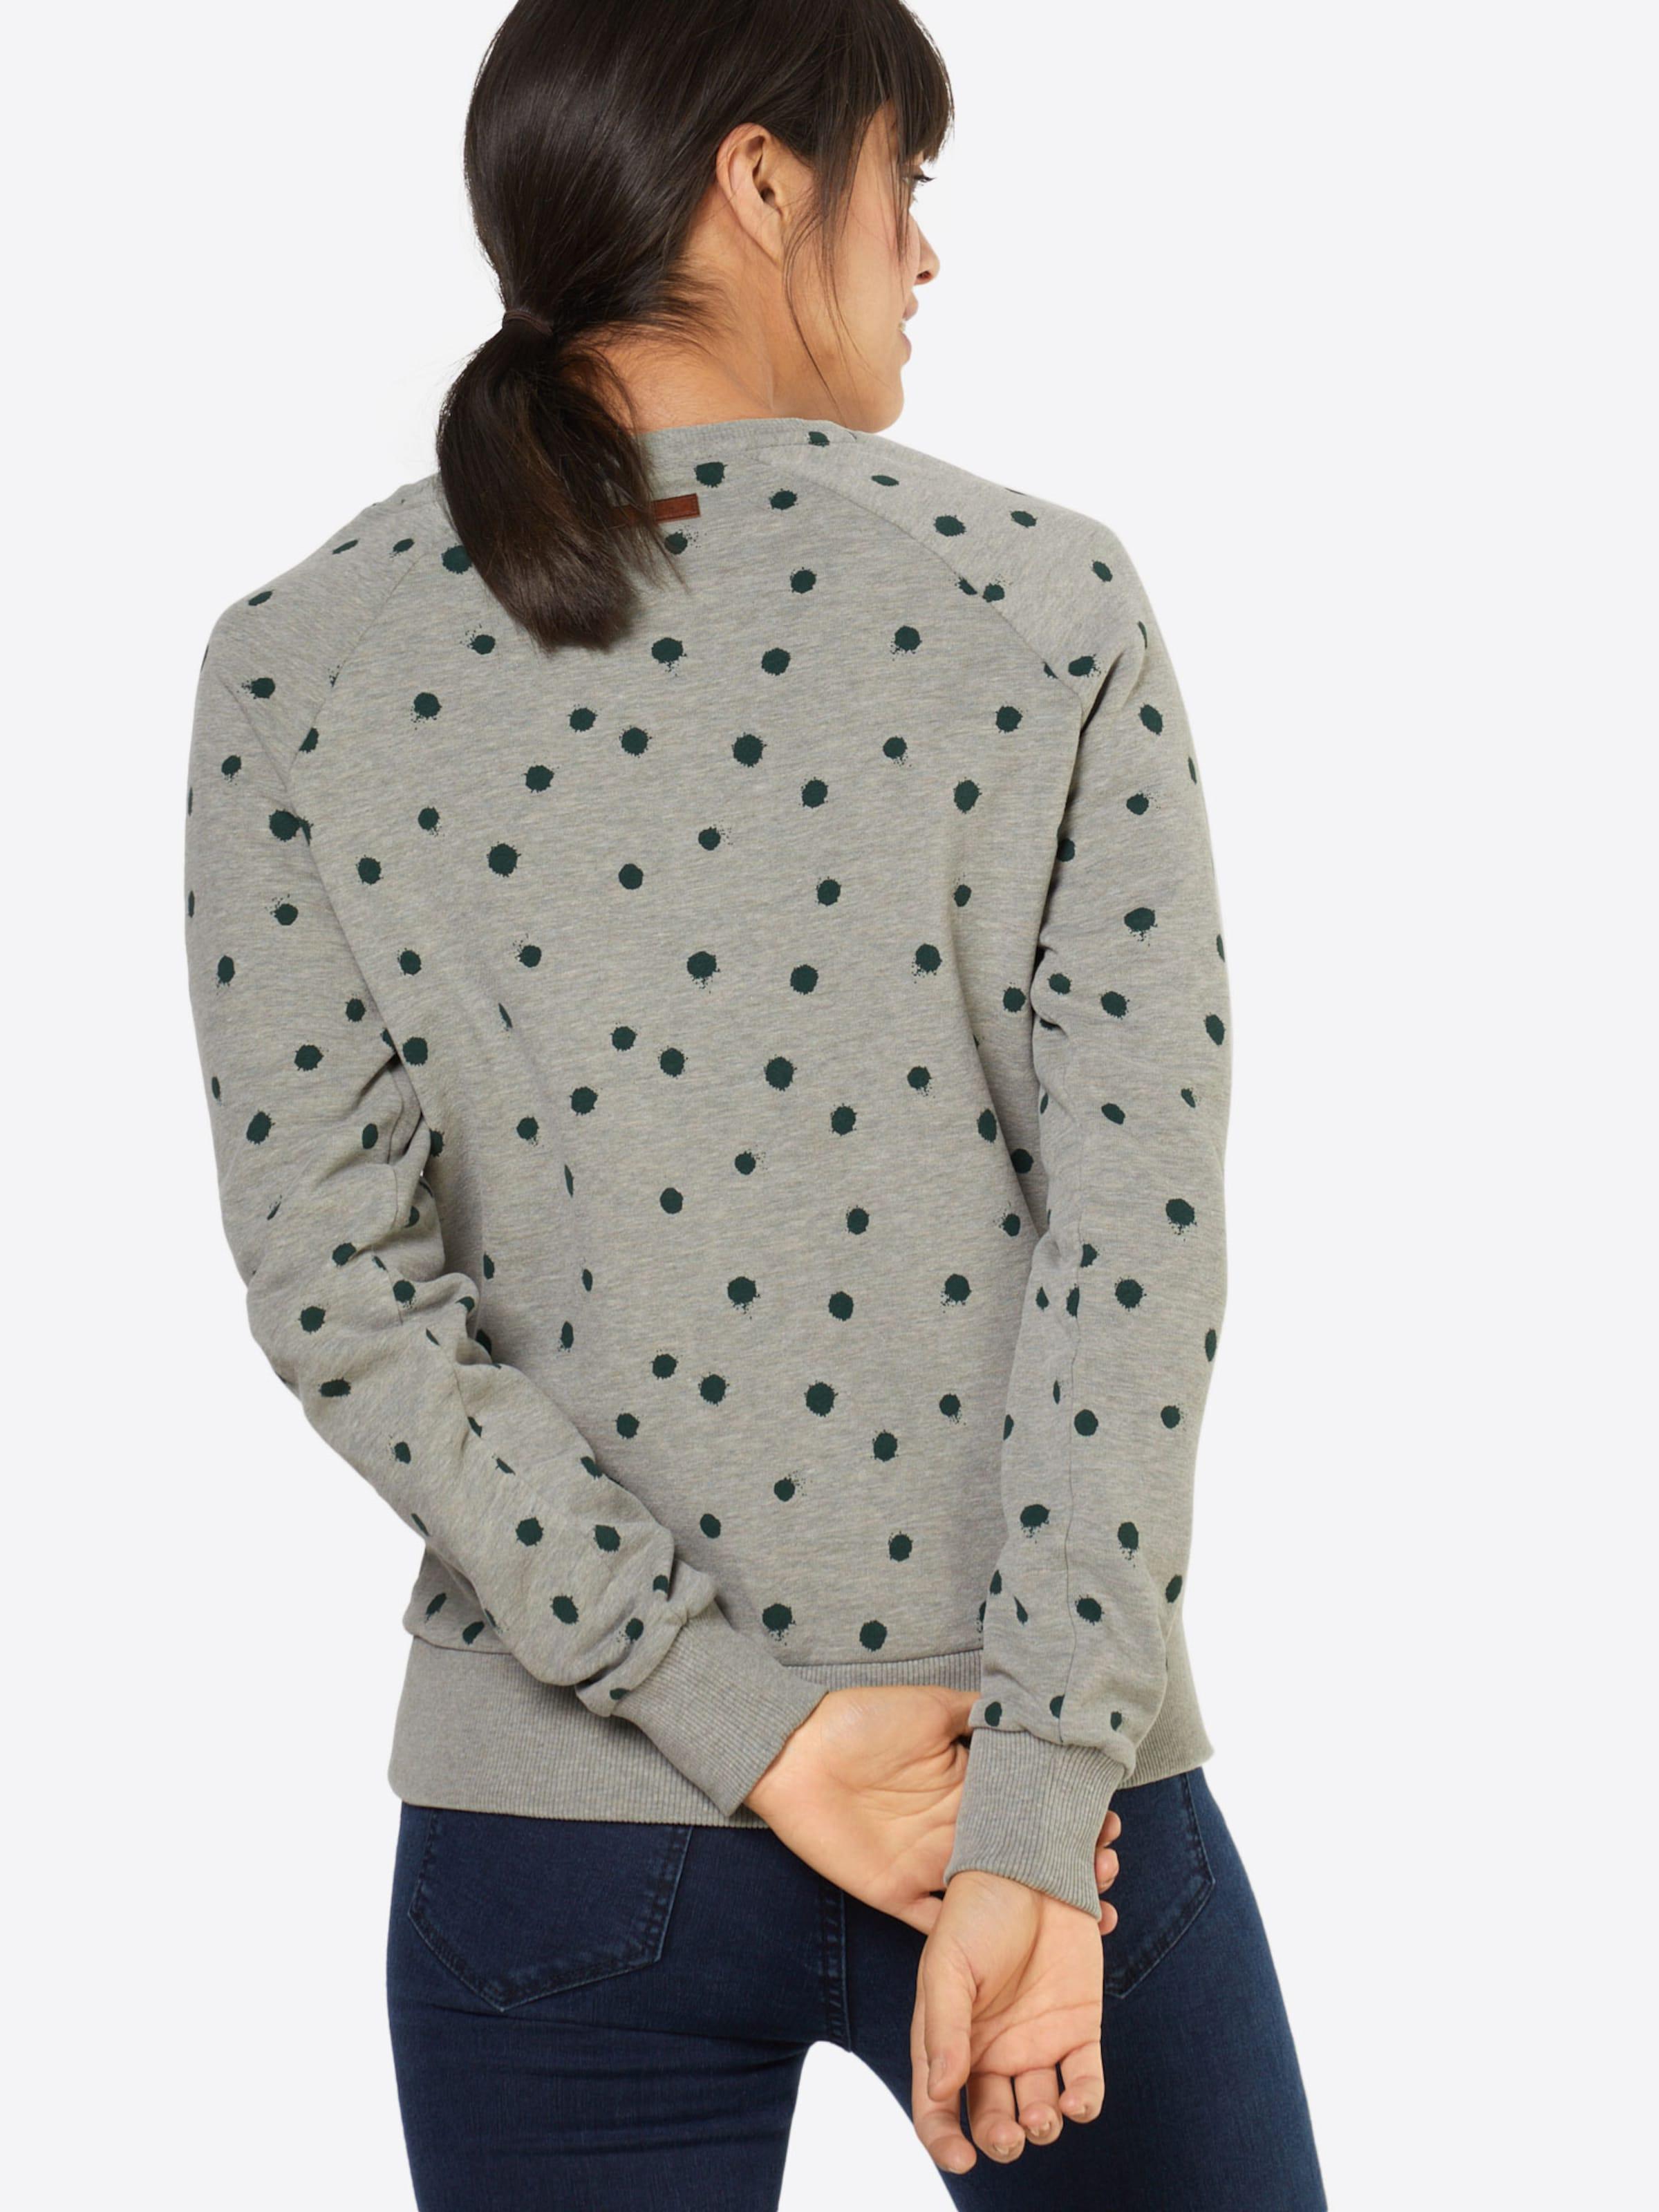 GrisSapin Sweat shirt En 'kokosnusskarl' Naketano 3qcR54LAj